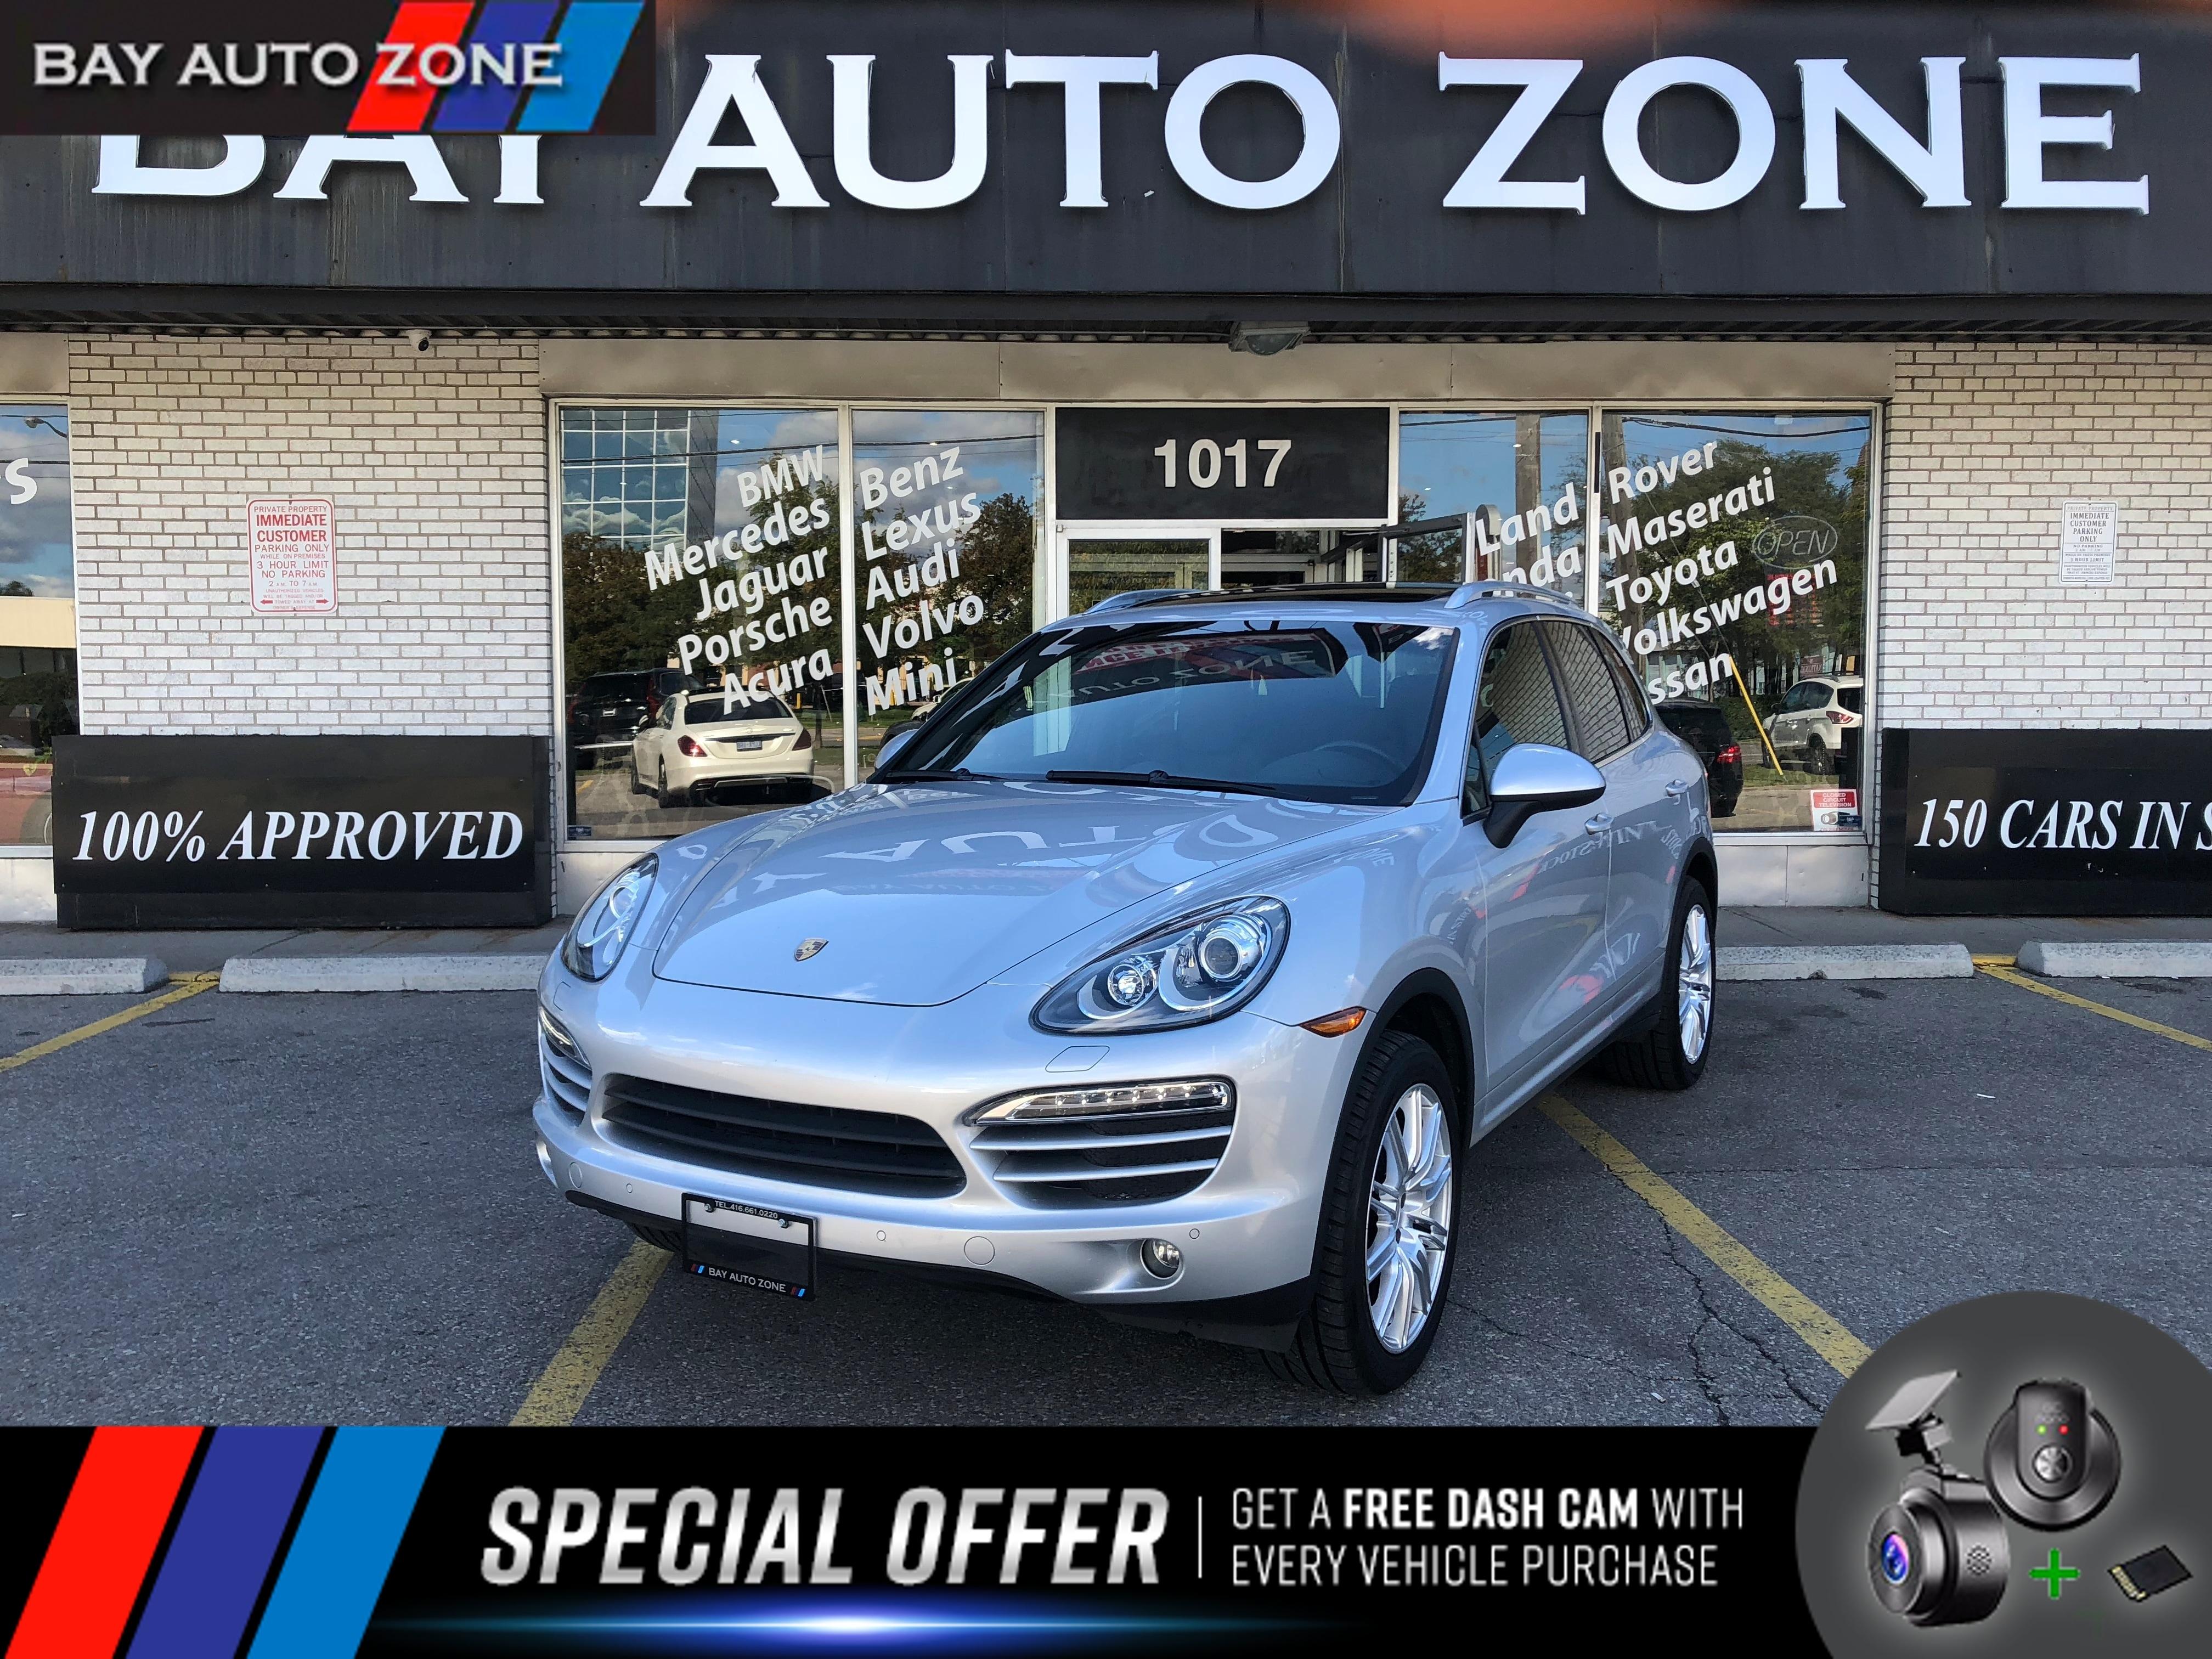 Used 2014 Porsche Cayenne Silver For Sale Toronto ON | Bay Auto Zone